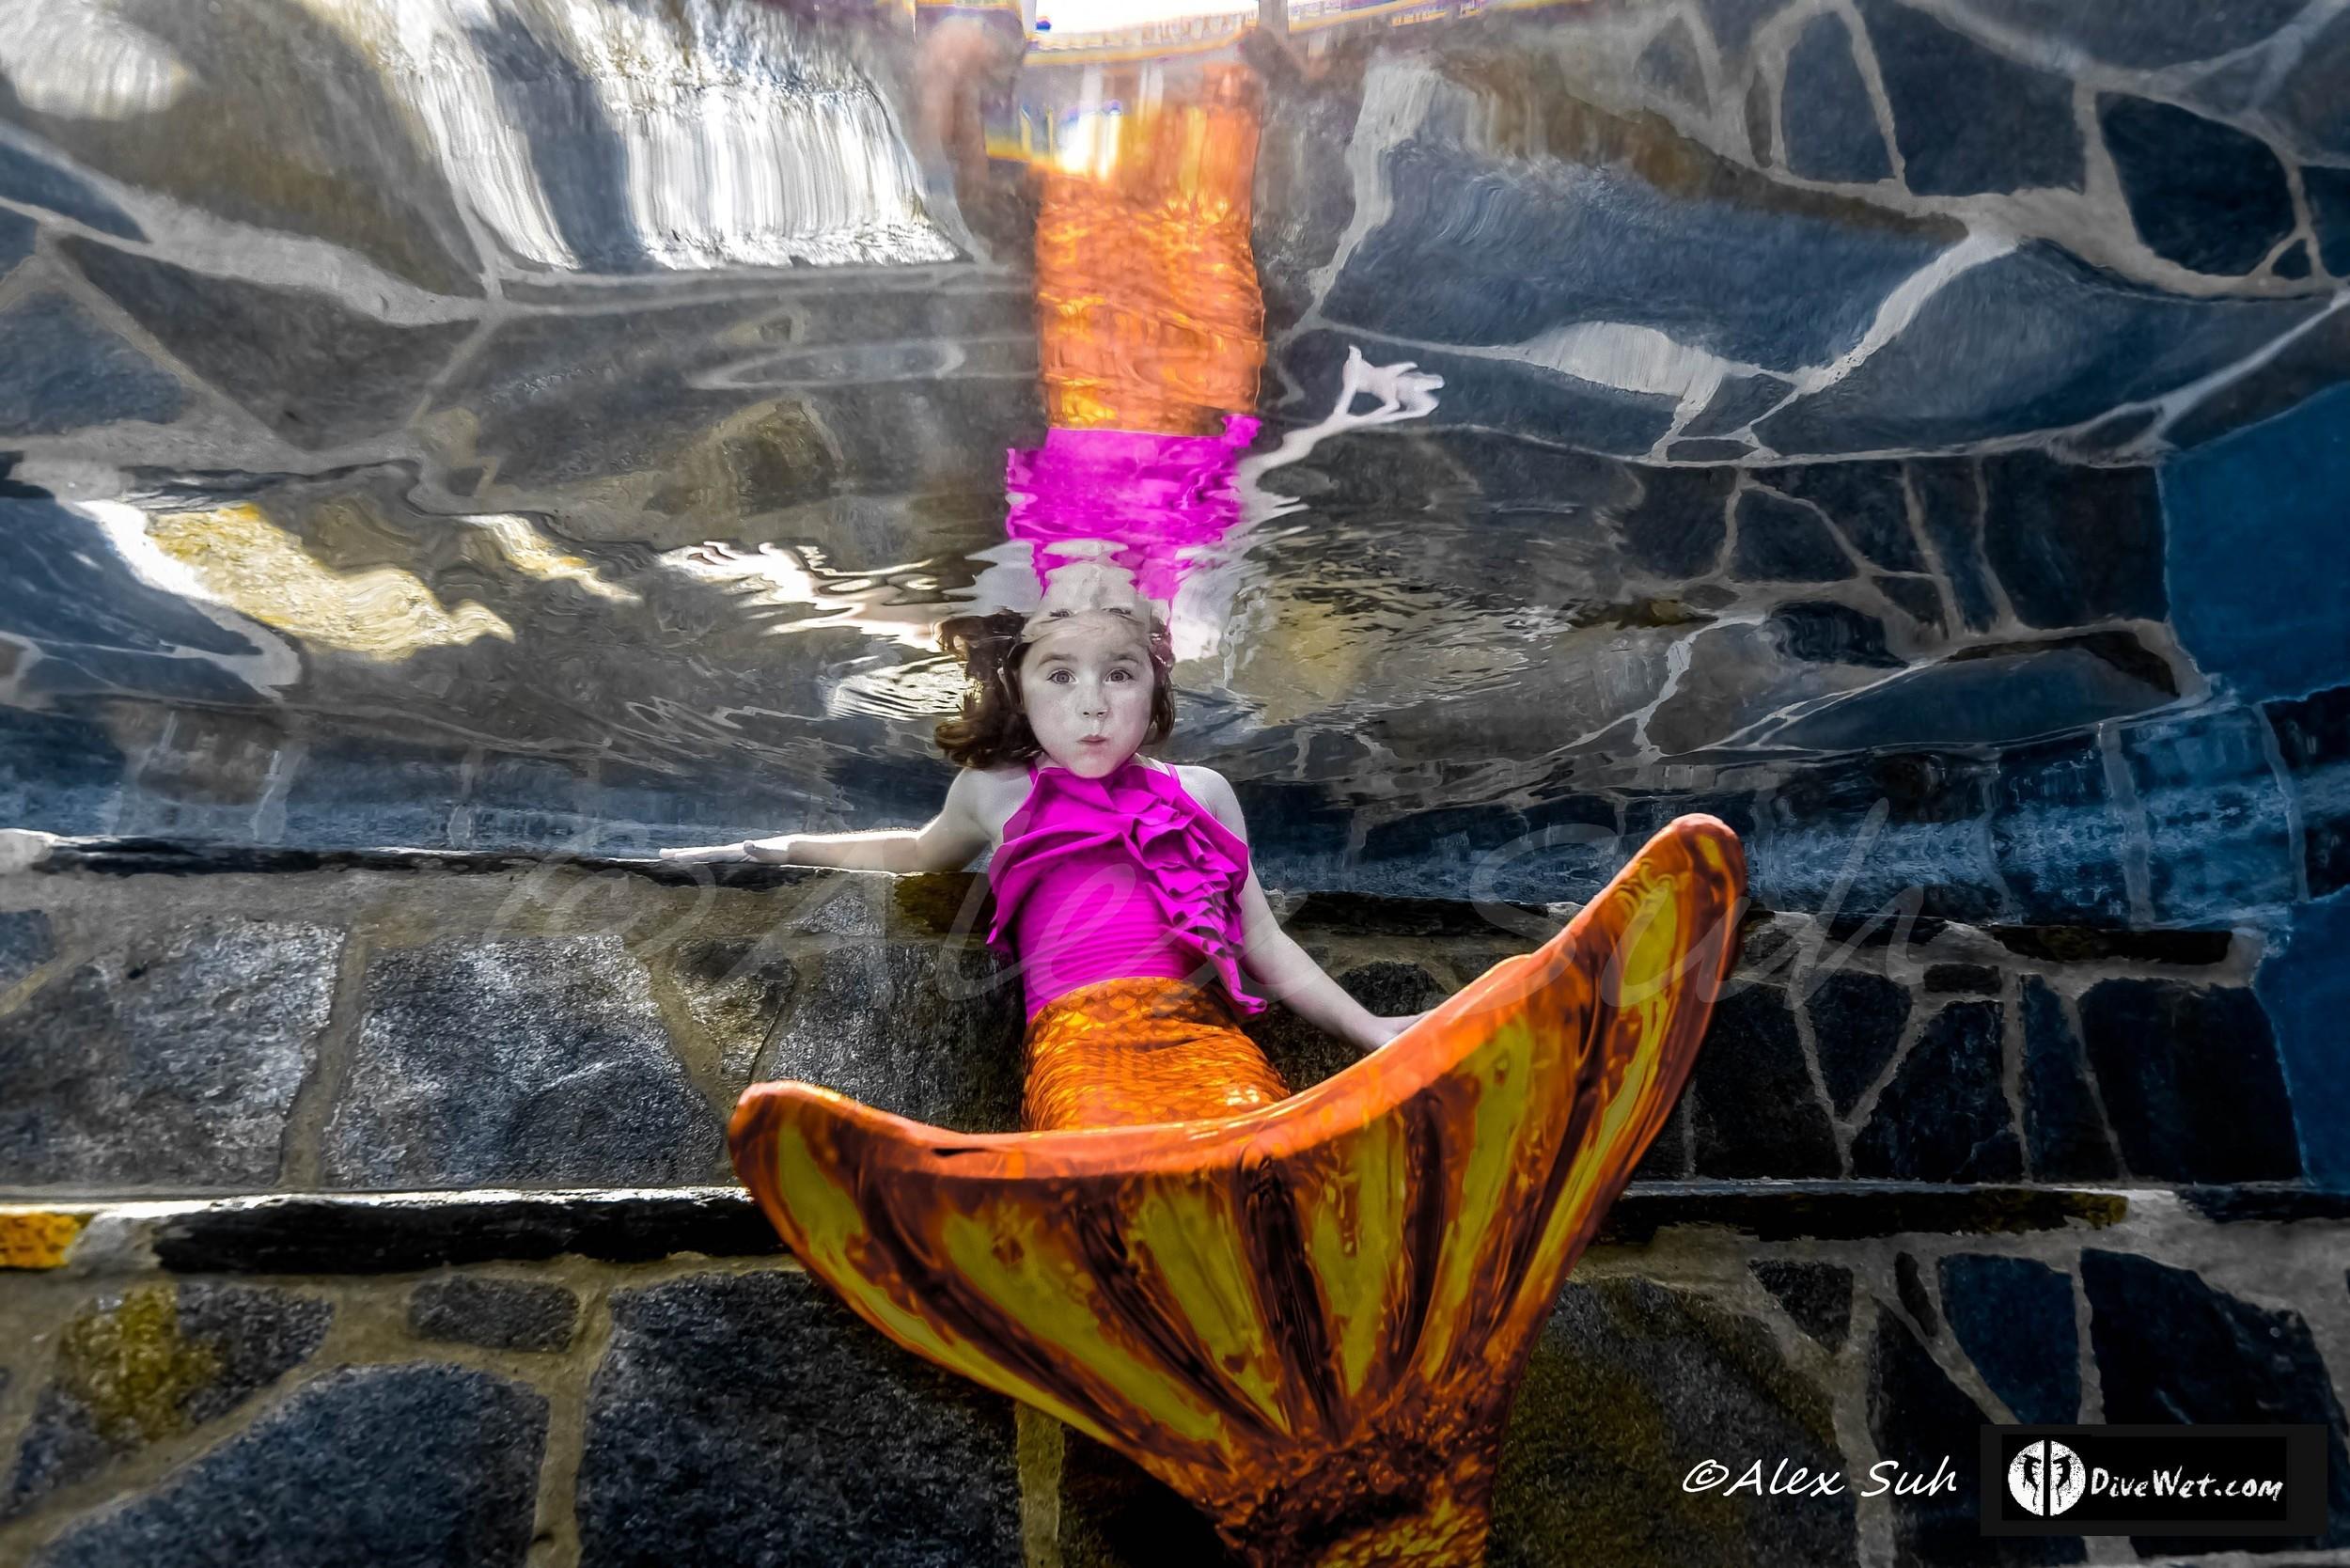 MARKED CENTER Pres Mermaid Relax_tn_tn.JPG